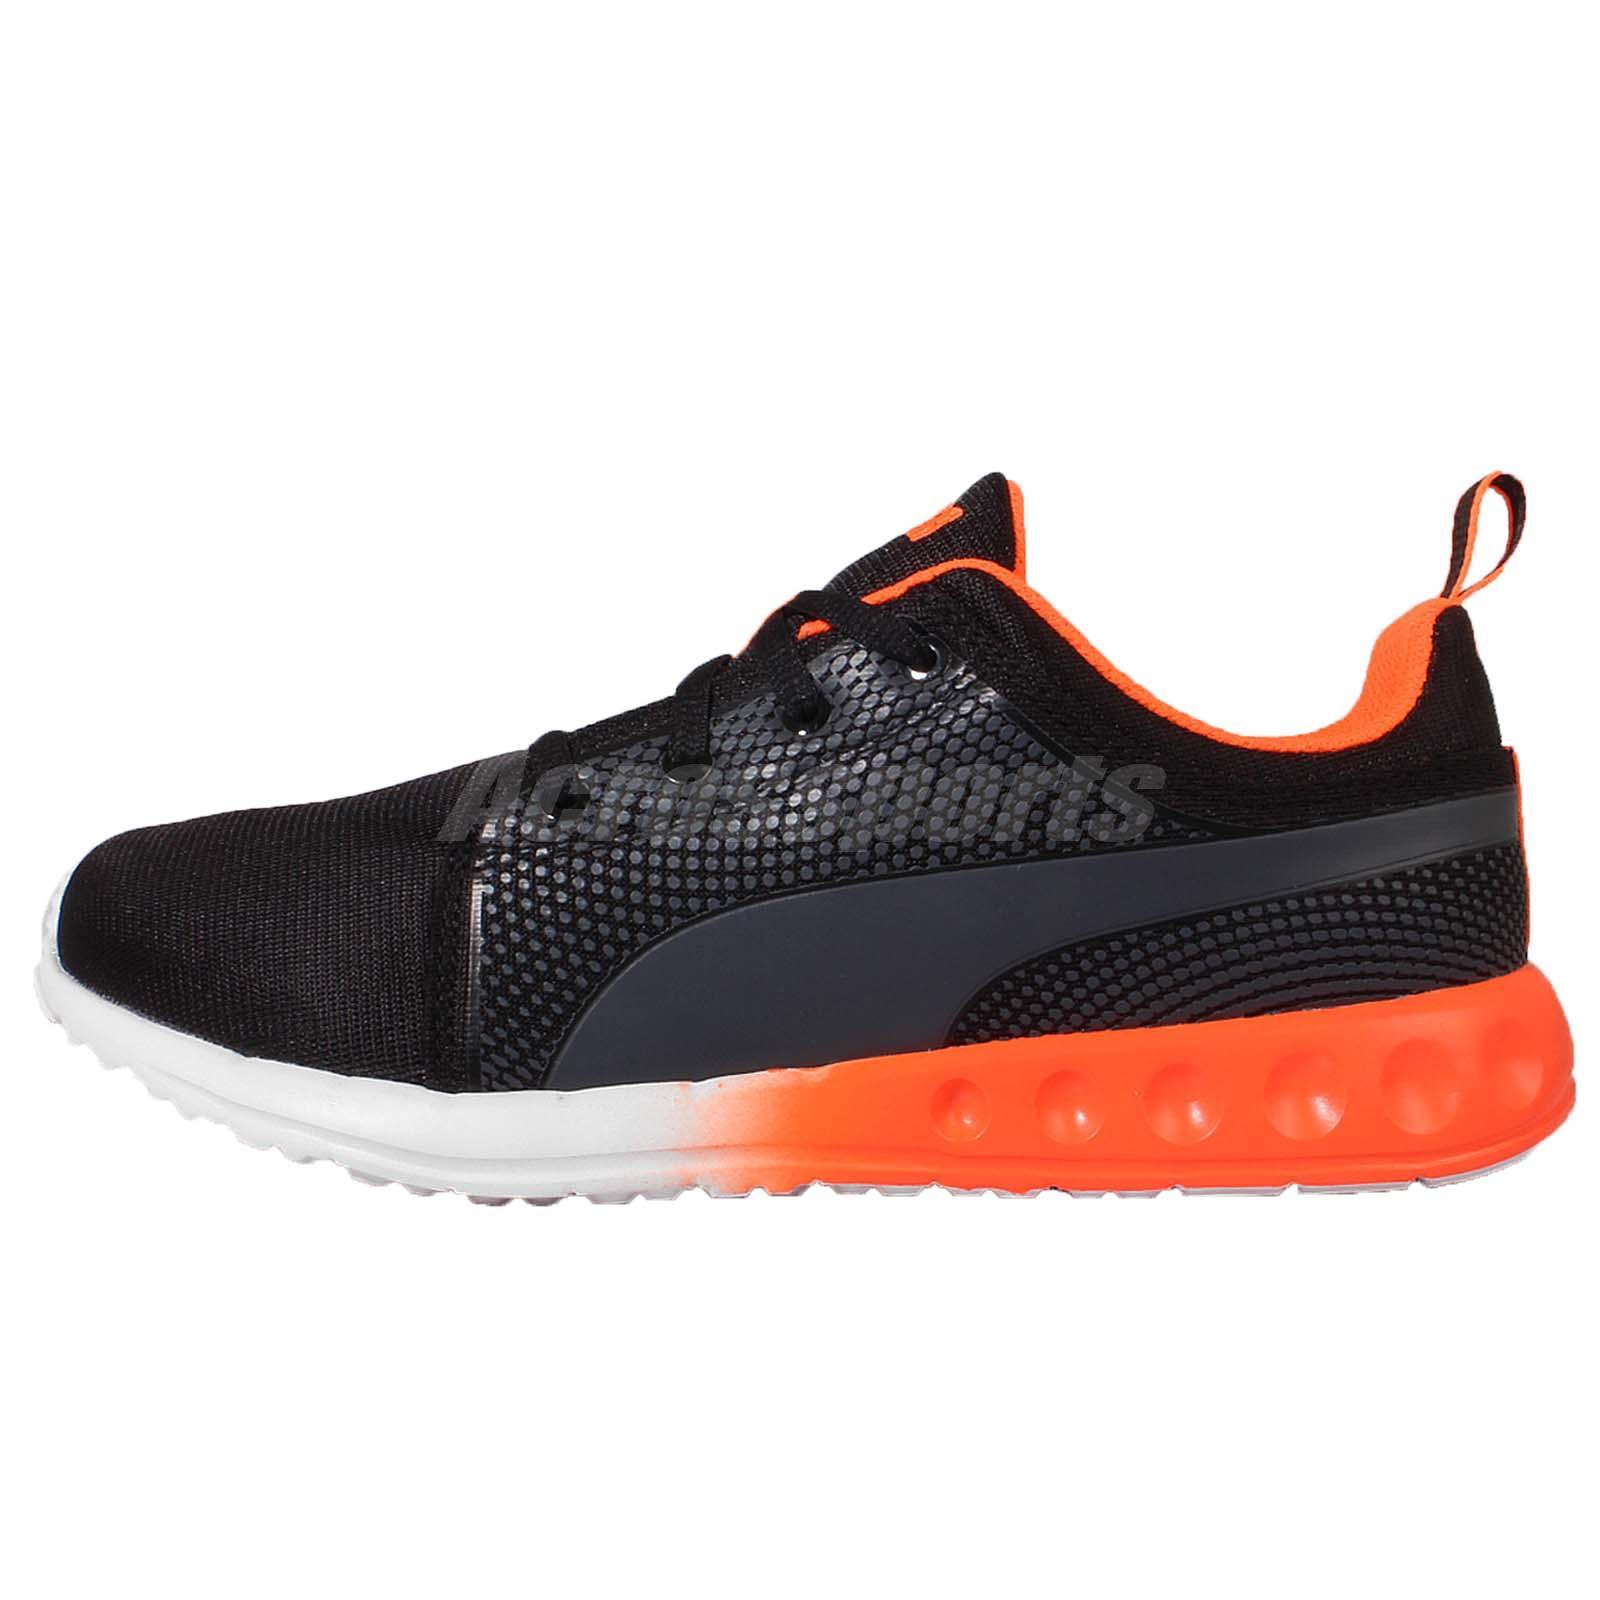 puma shoes virat kohli adds aviation wx